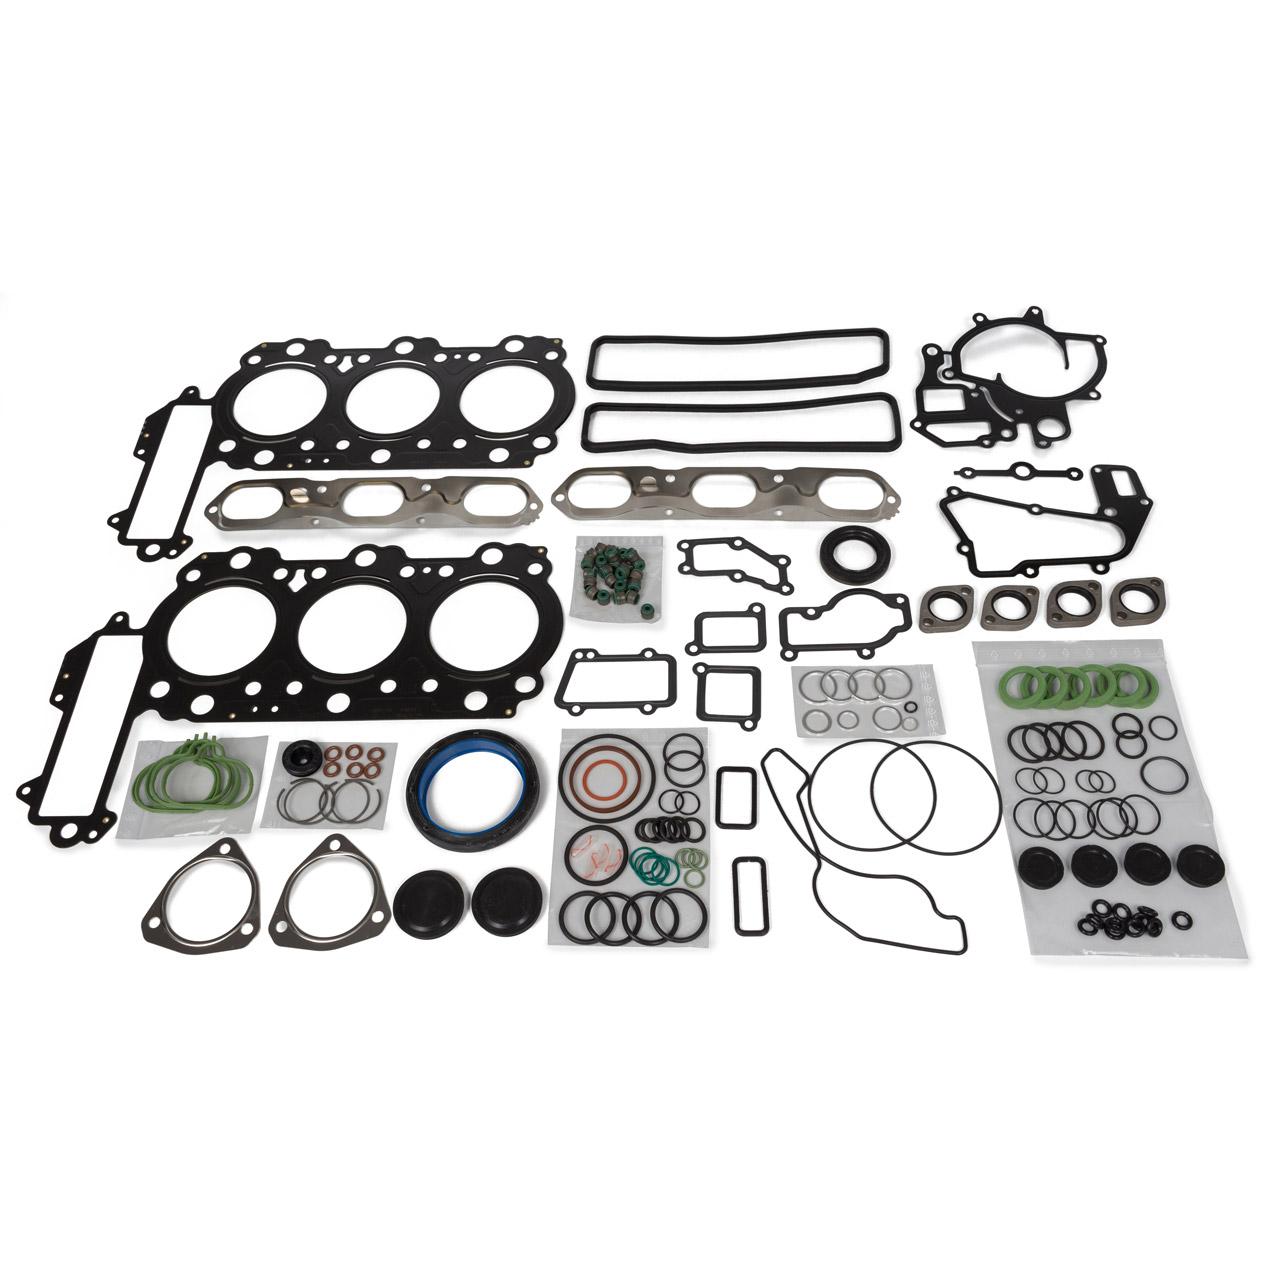 Motordichtungssatz PORSCHE 997 3.6 Carrera / 4 320/325 PS M96.05